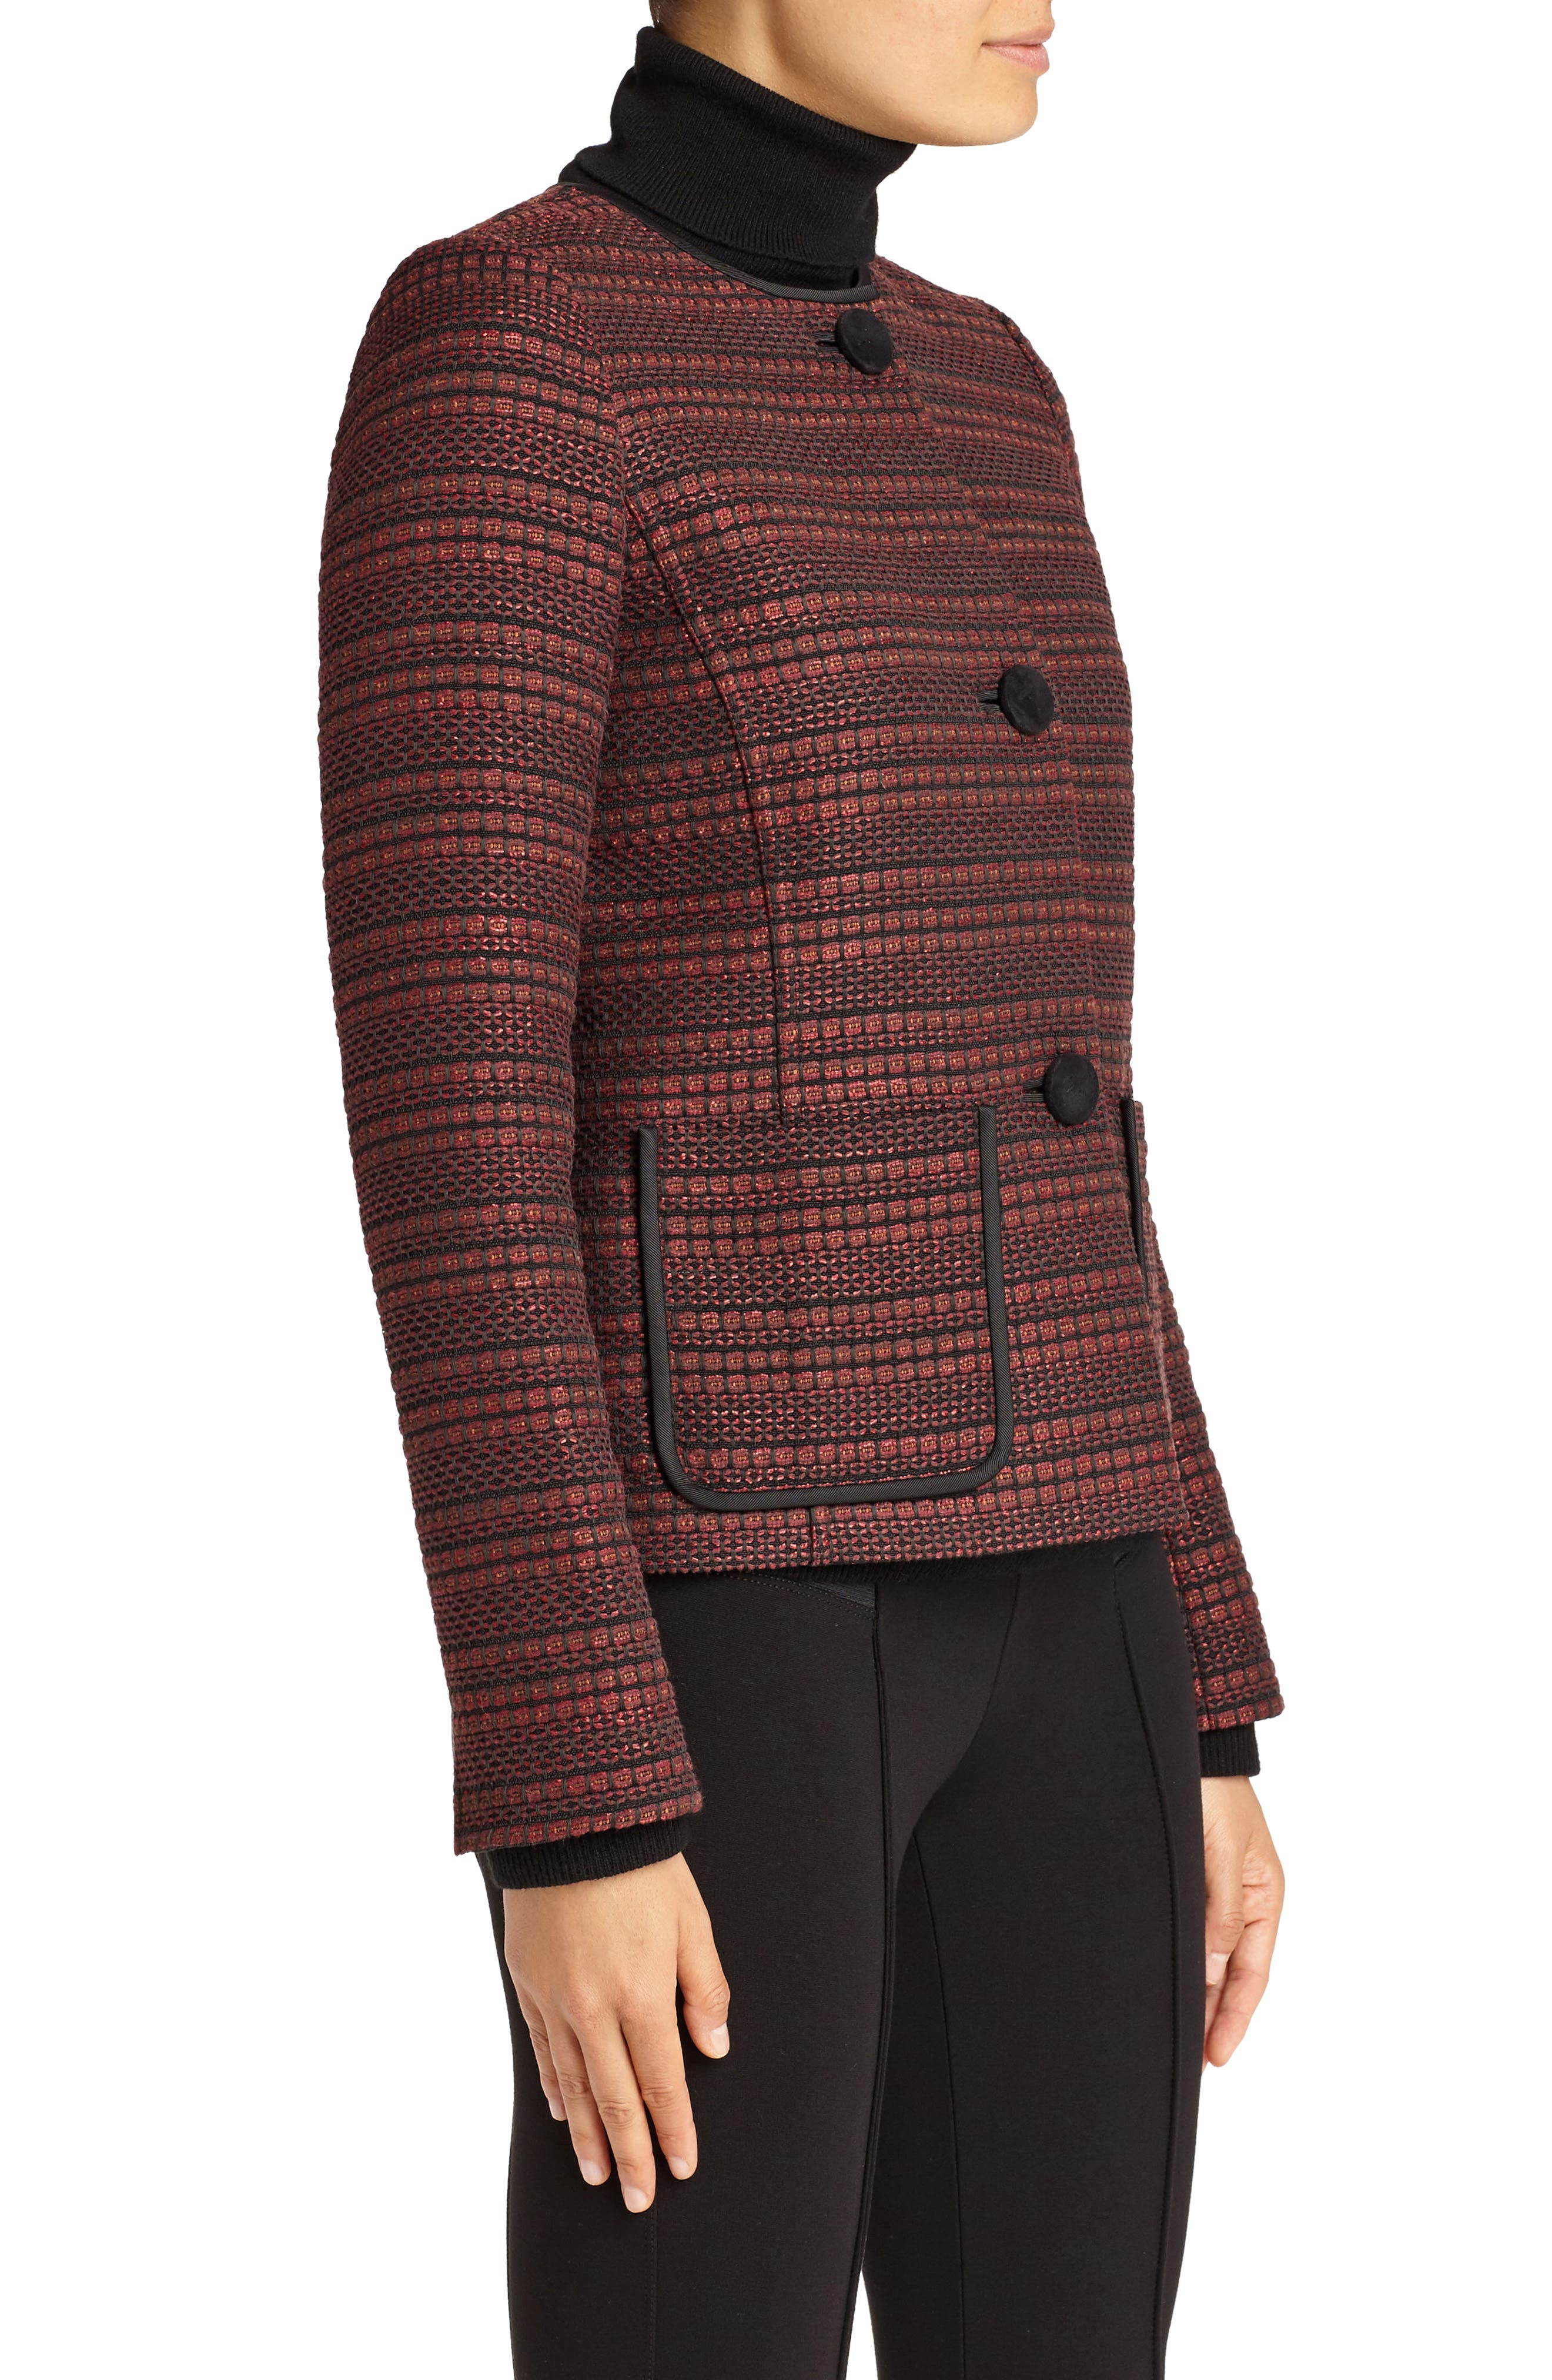 Laurence Venetian Tweed Jacket,                             Alternate thumbnail 3, color,                             Shiraz Multi